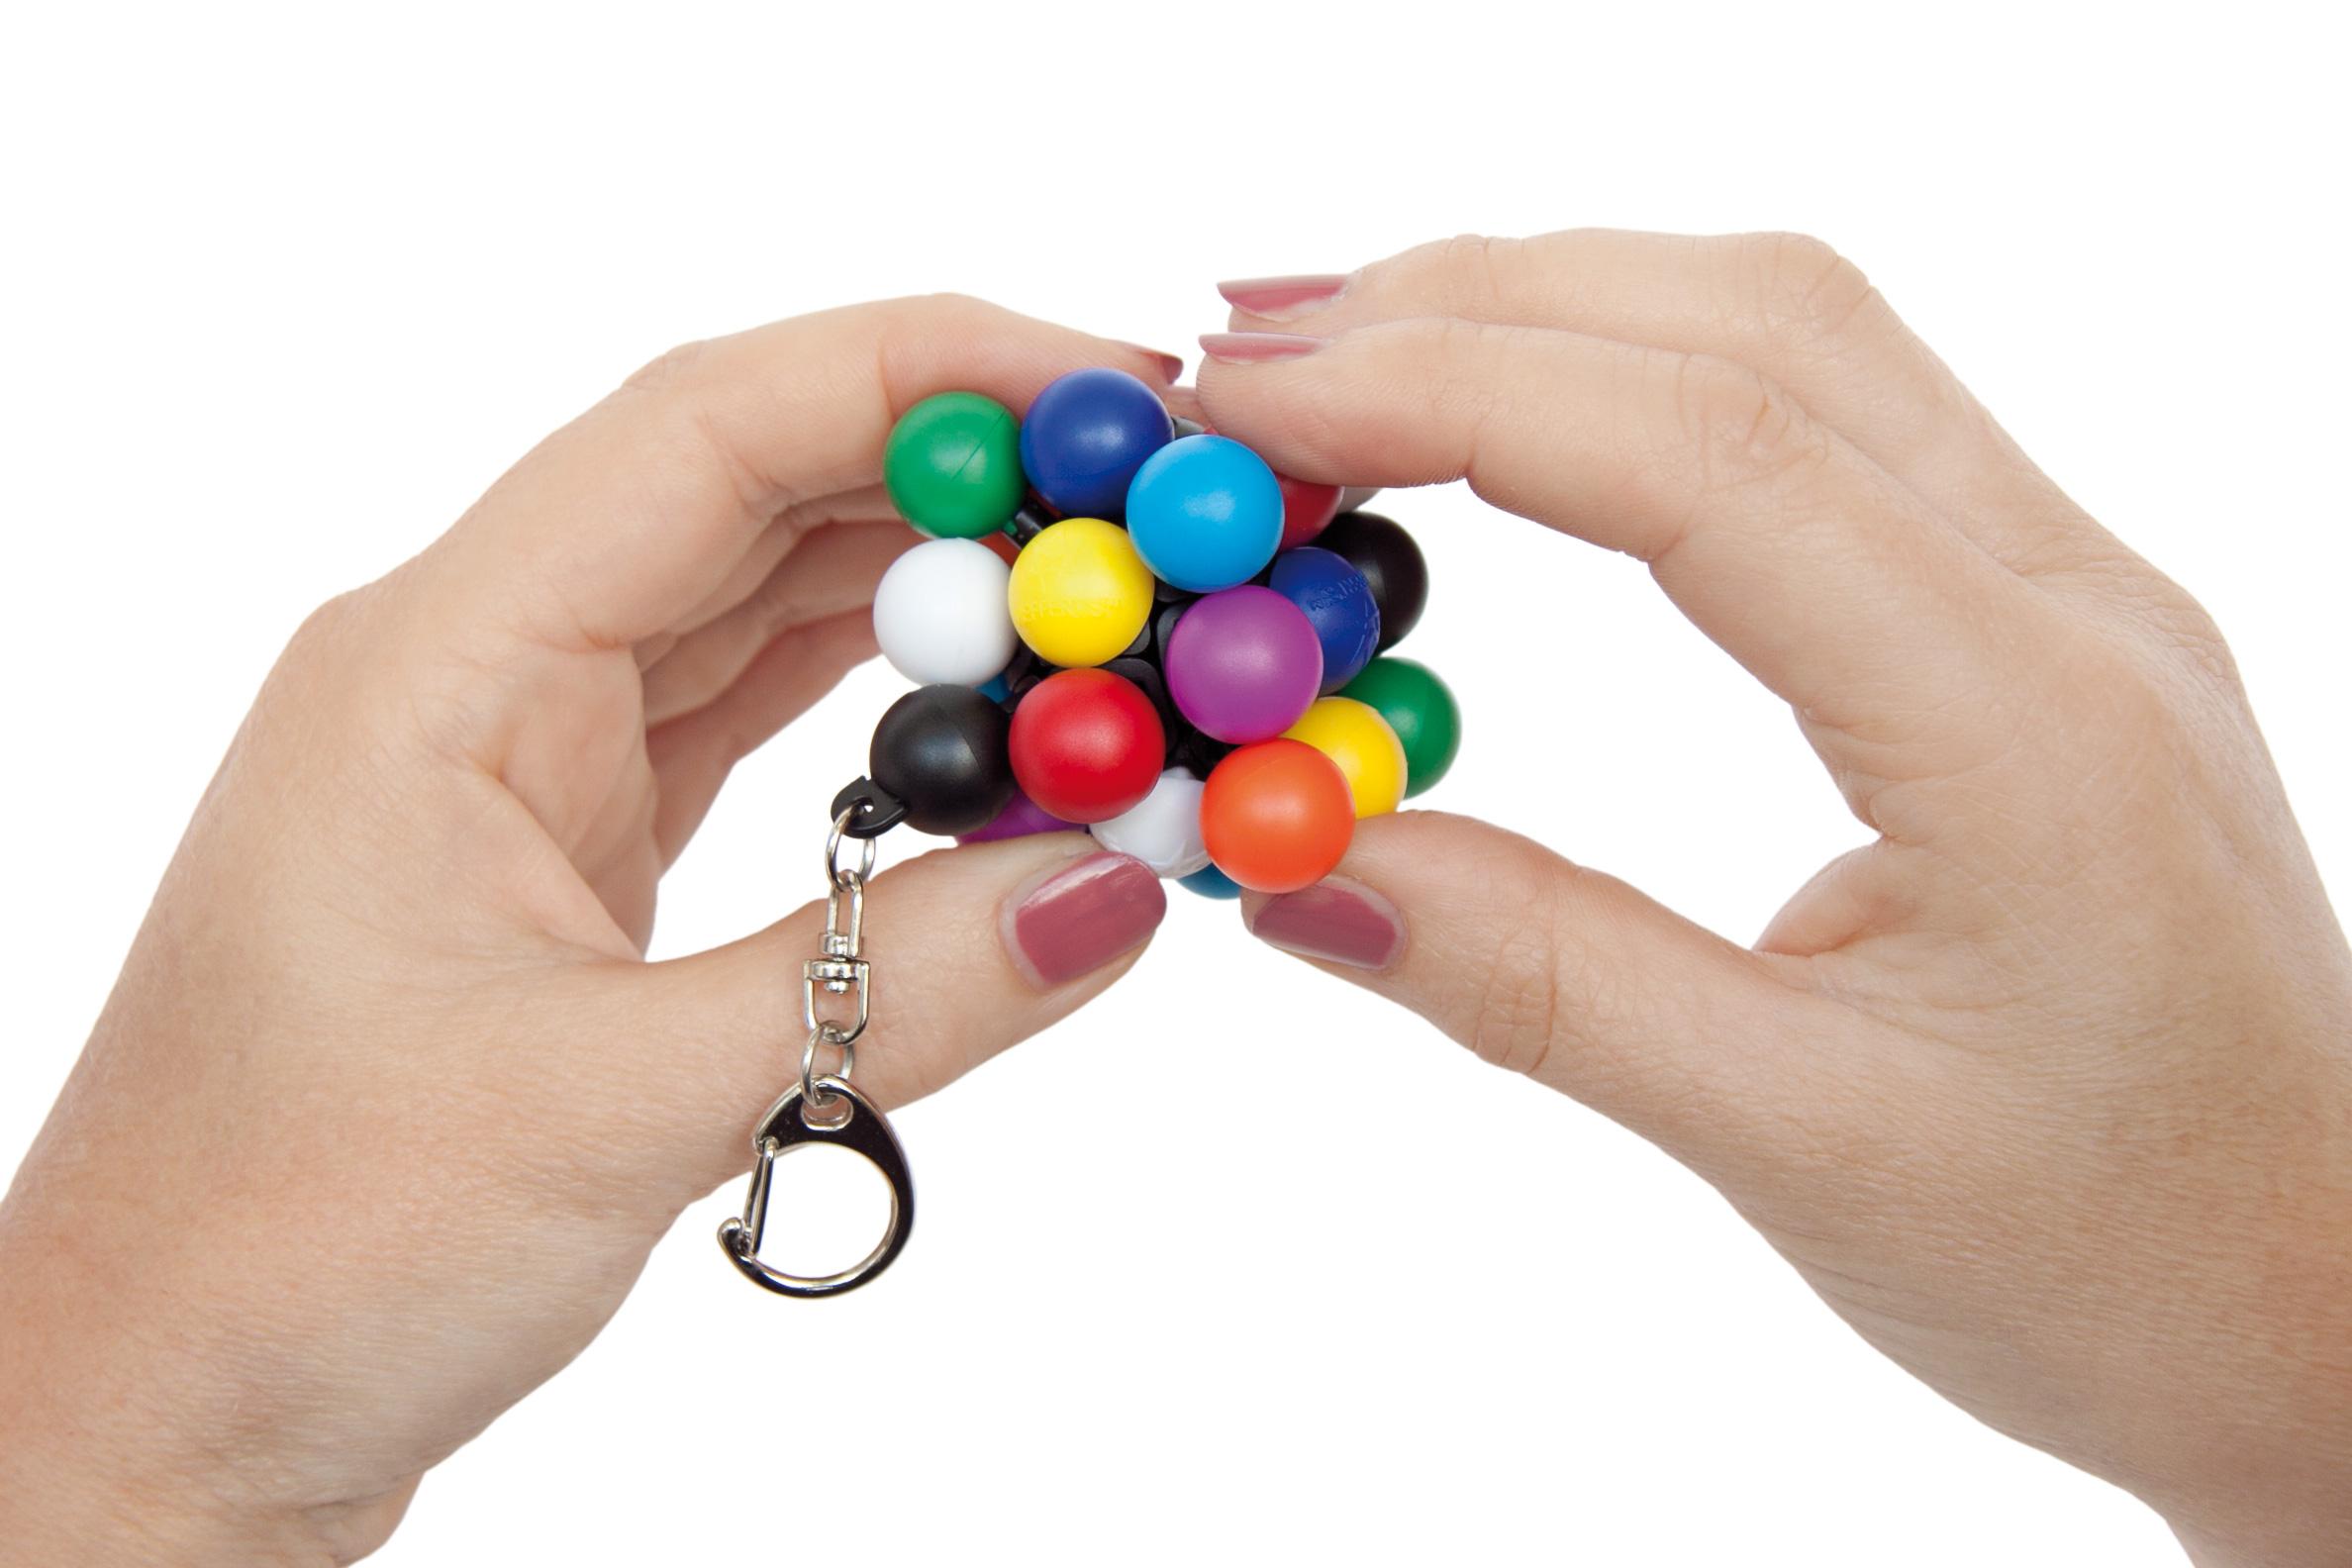 RecentToys-MiniMolecube-Mefferts-hands